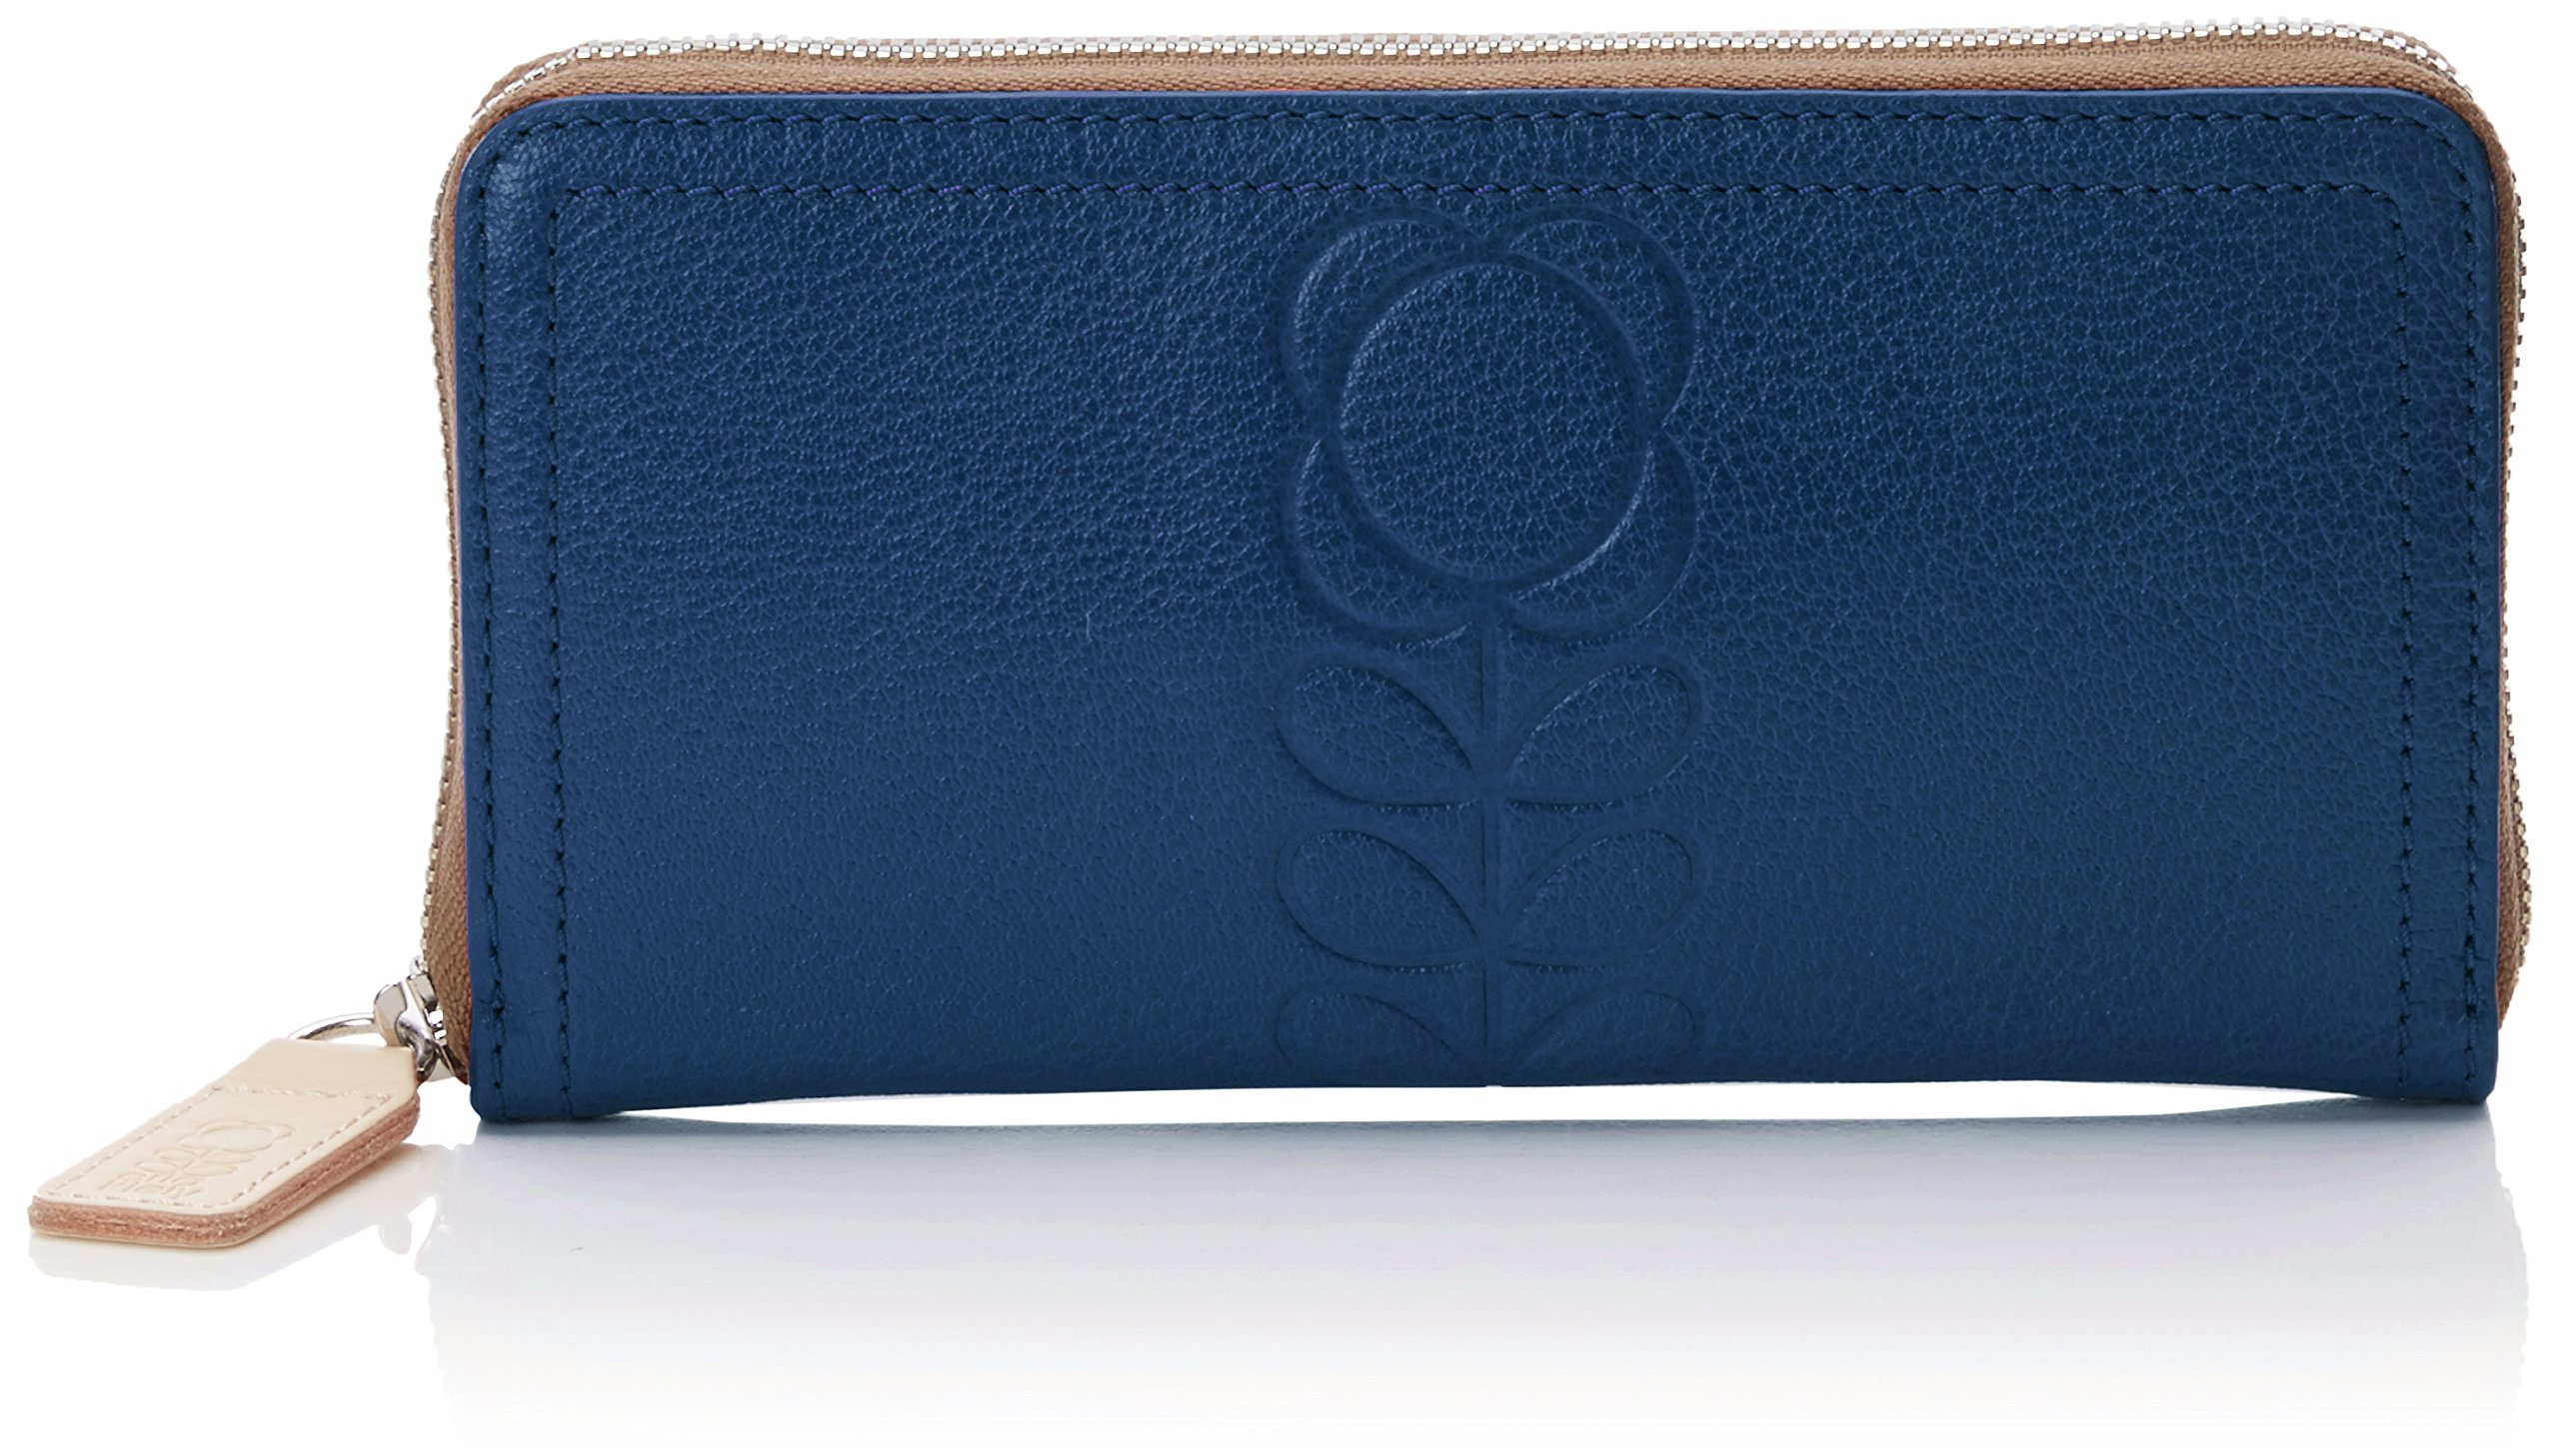 Embossed Flower Leather Big Zip Wallet Wallet, Indigo, One Size